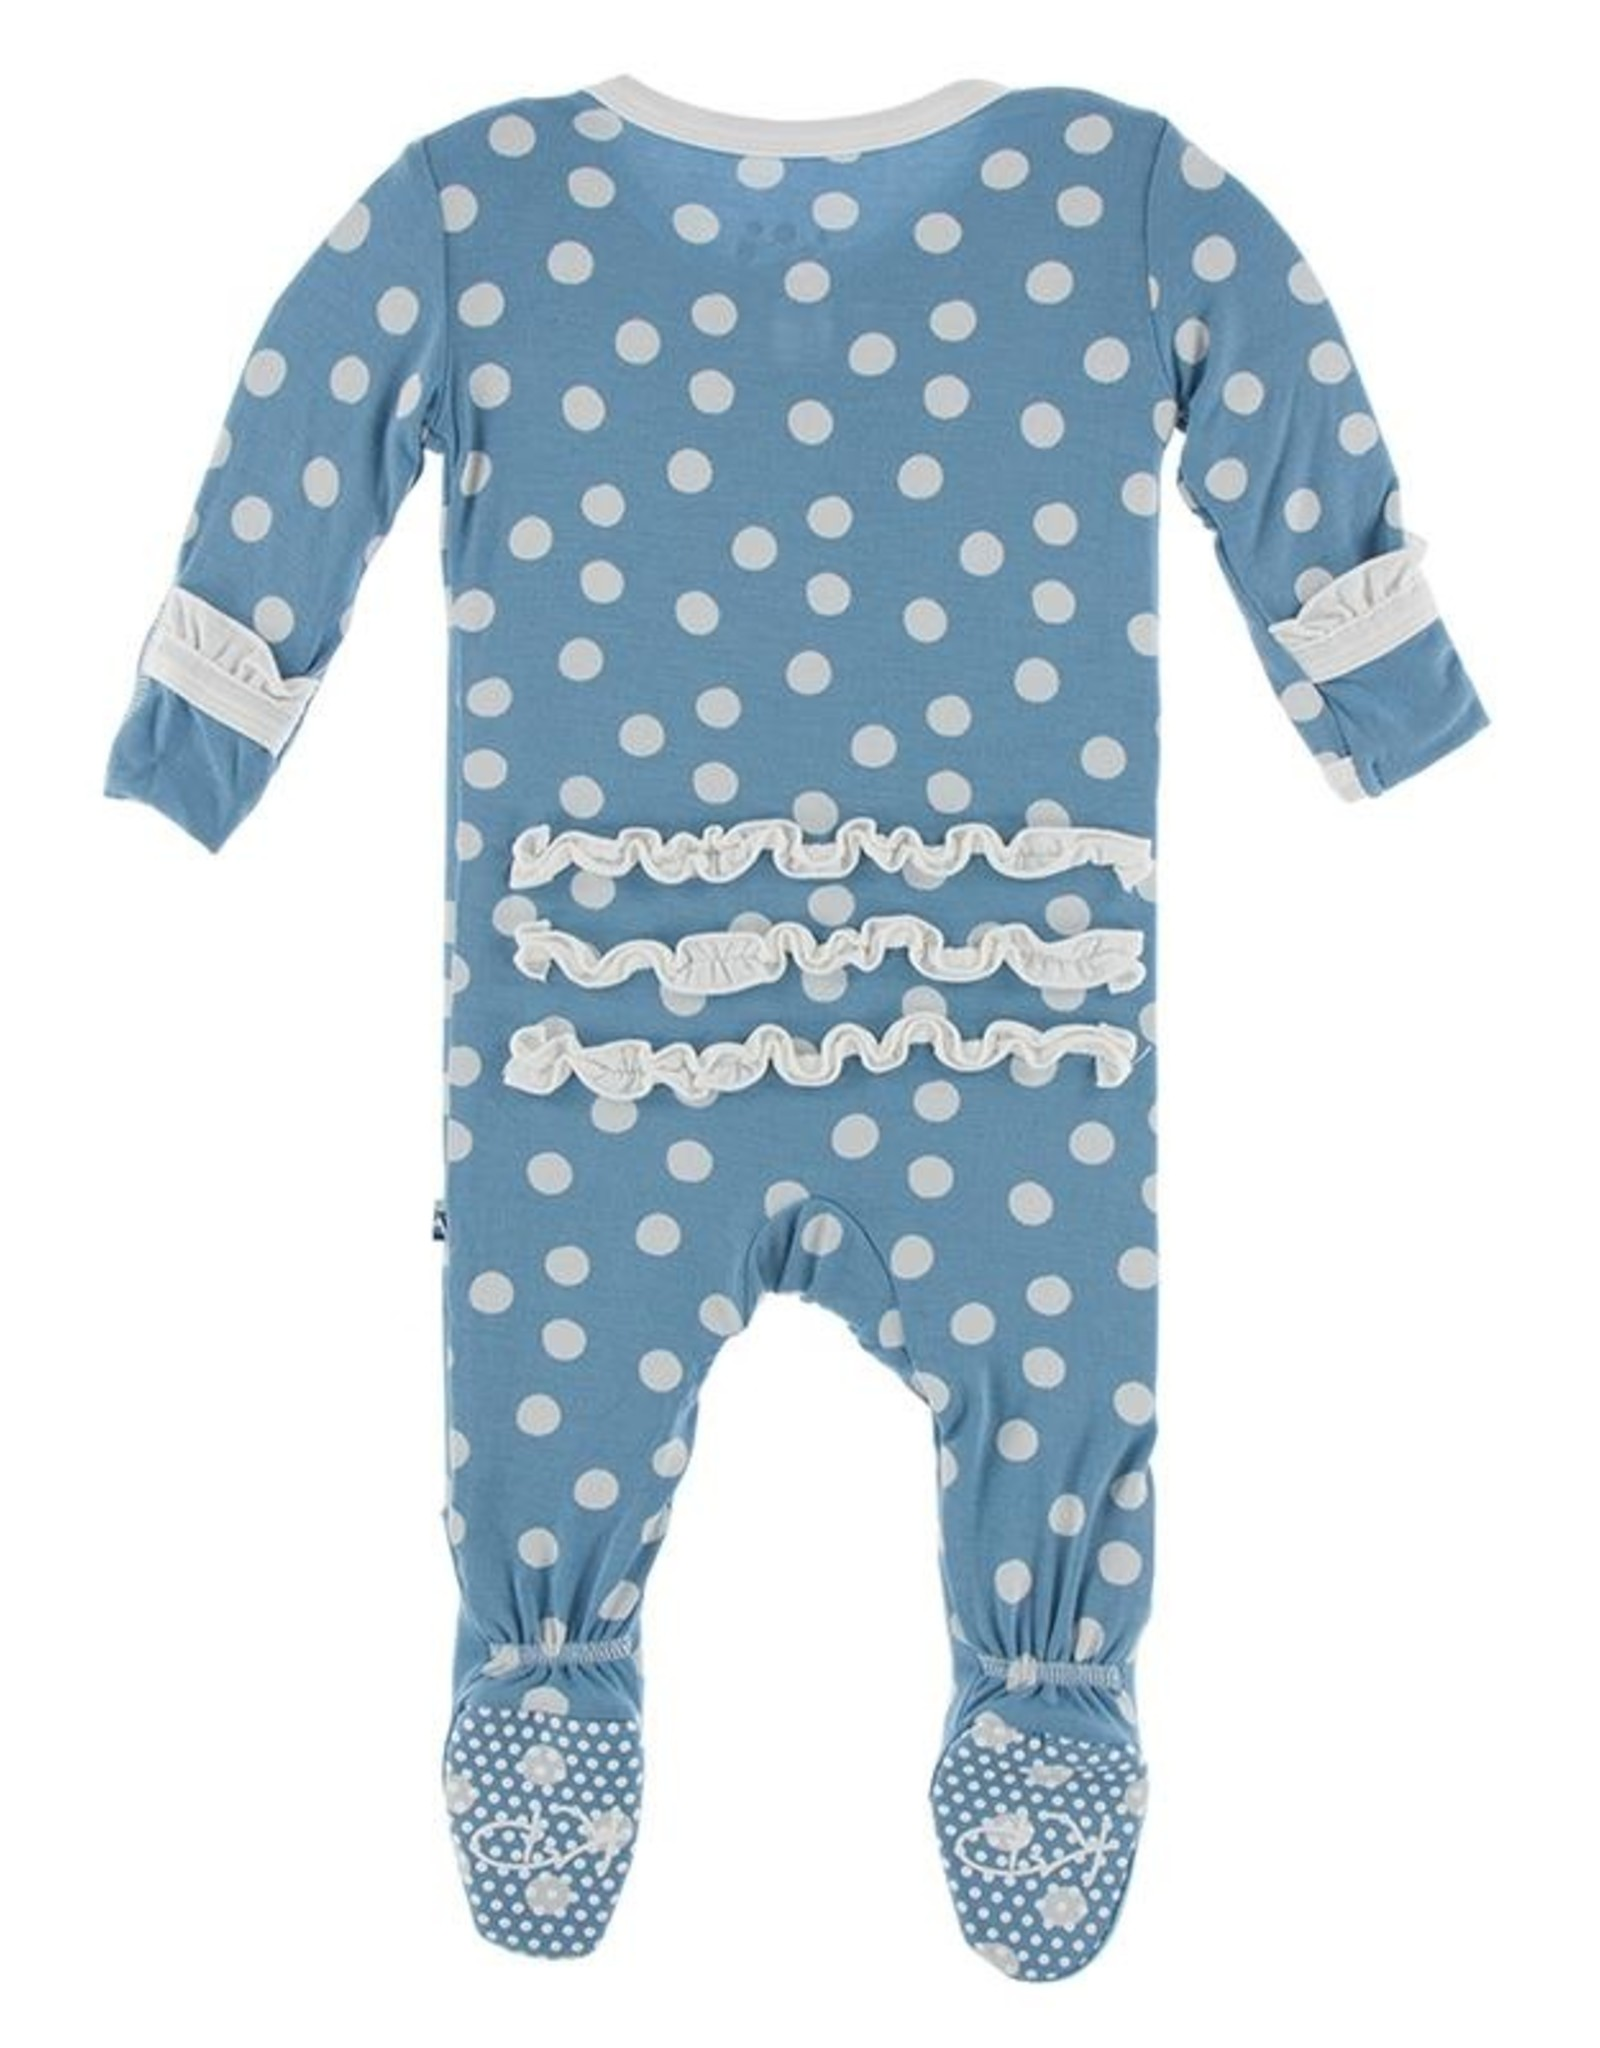 Kickee Pants Kickee Pants Holiday Muffin Ruffle Footie With Zipper Blue Moon Snowballs